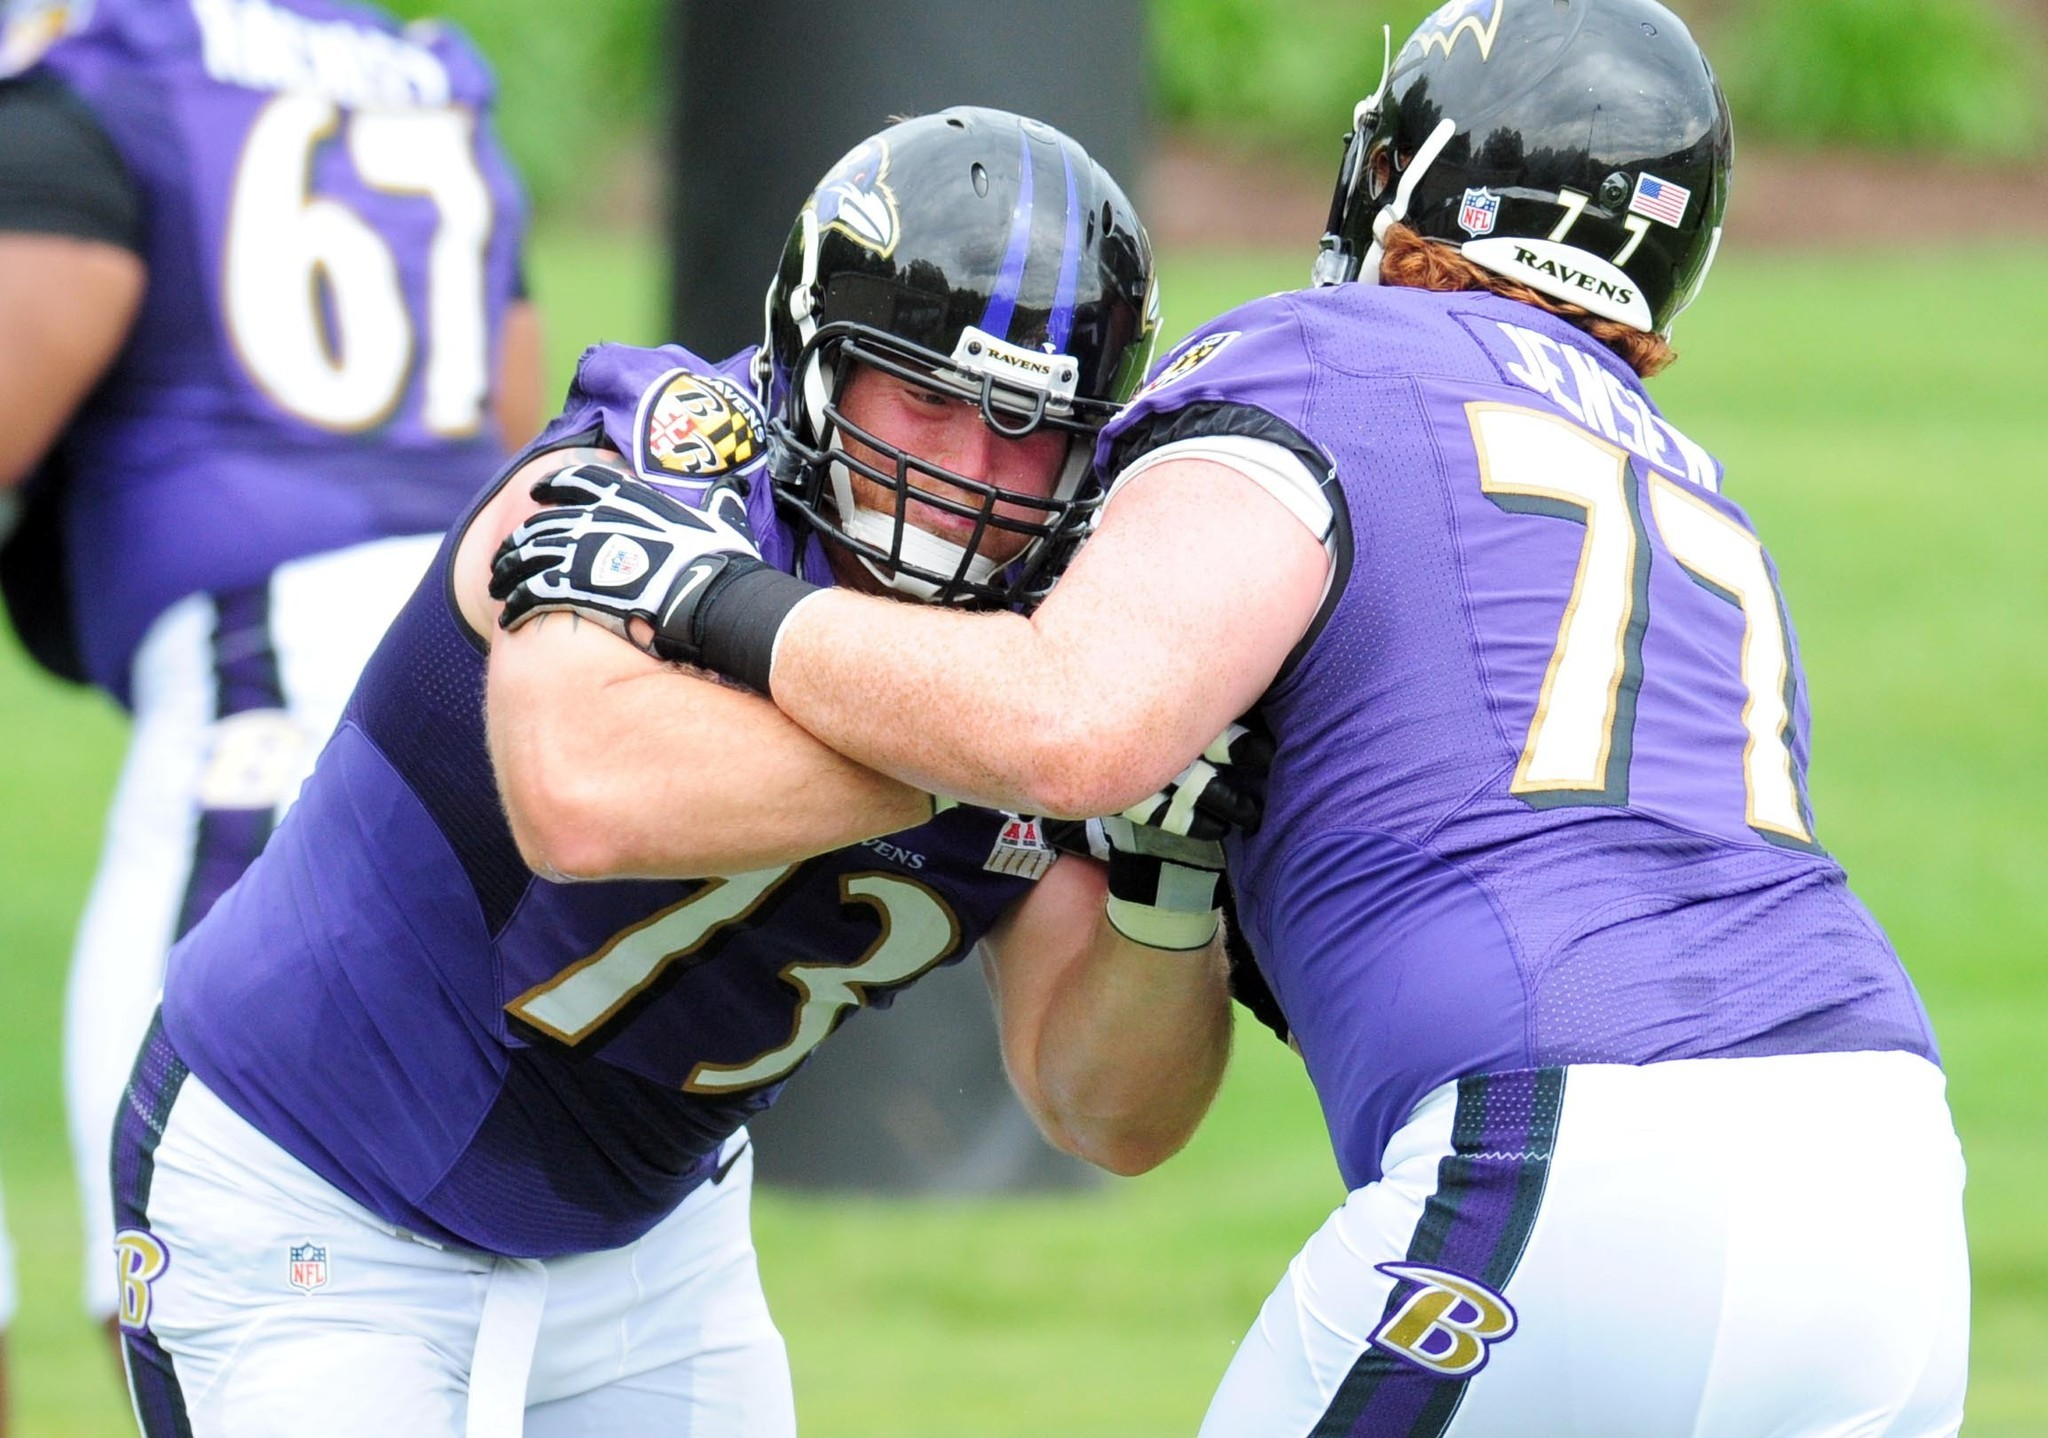 Ravens Pro Bowl guard Marshal Yanda back to full strength